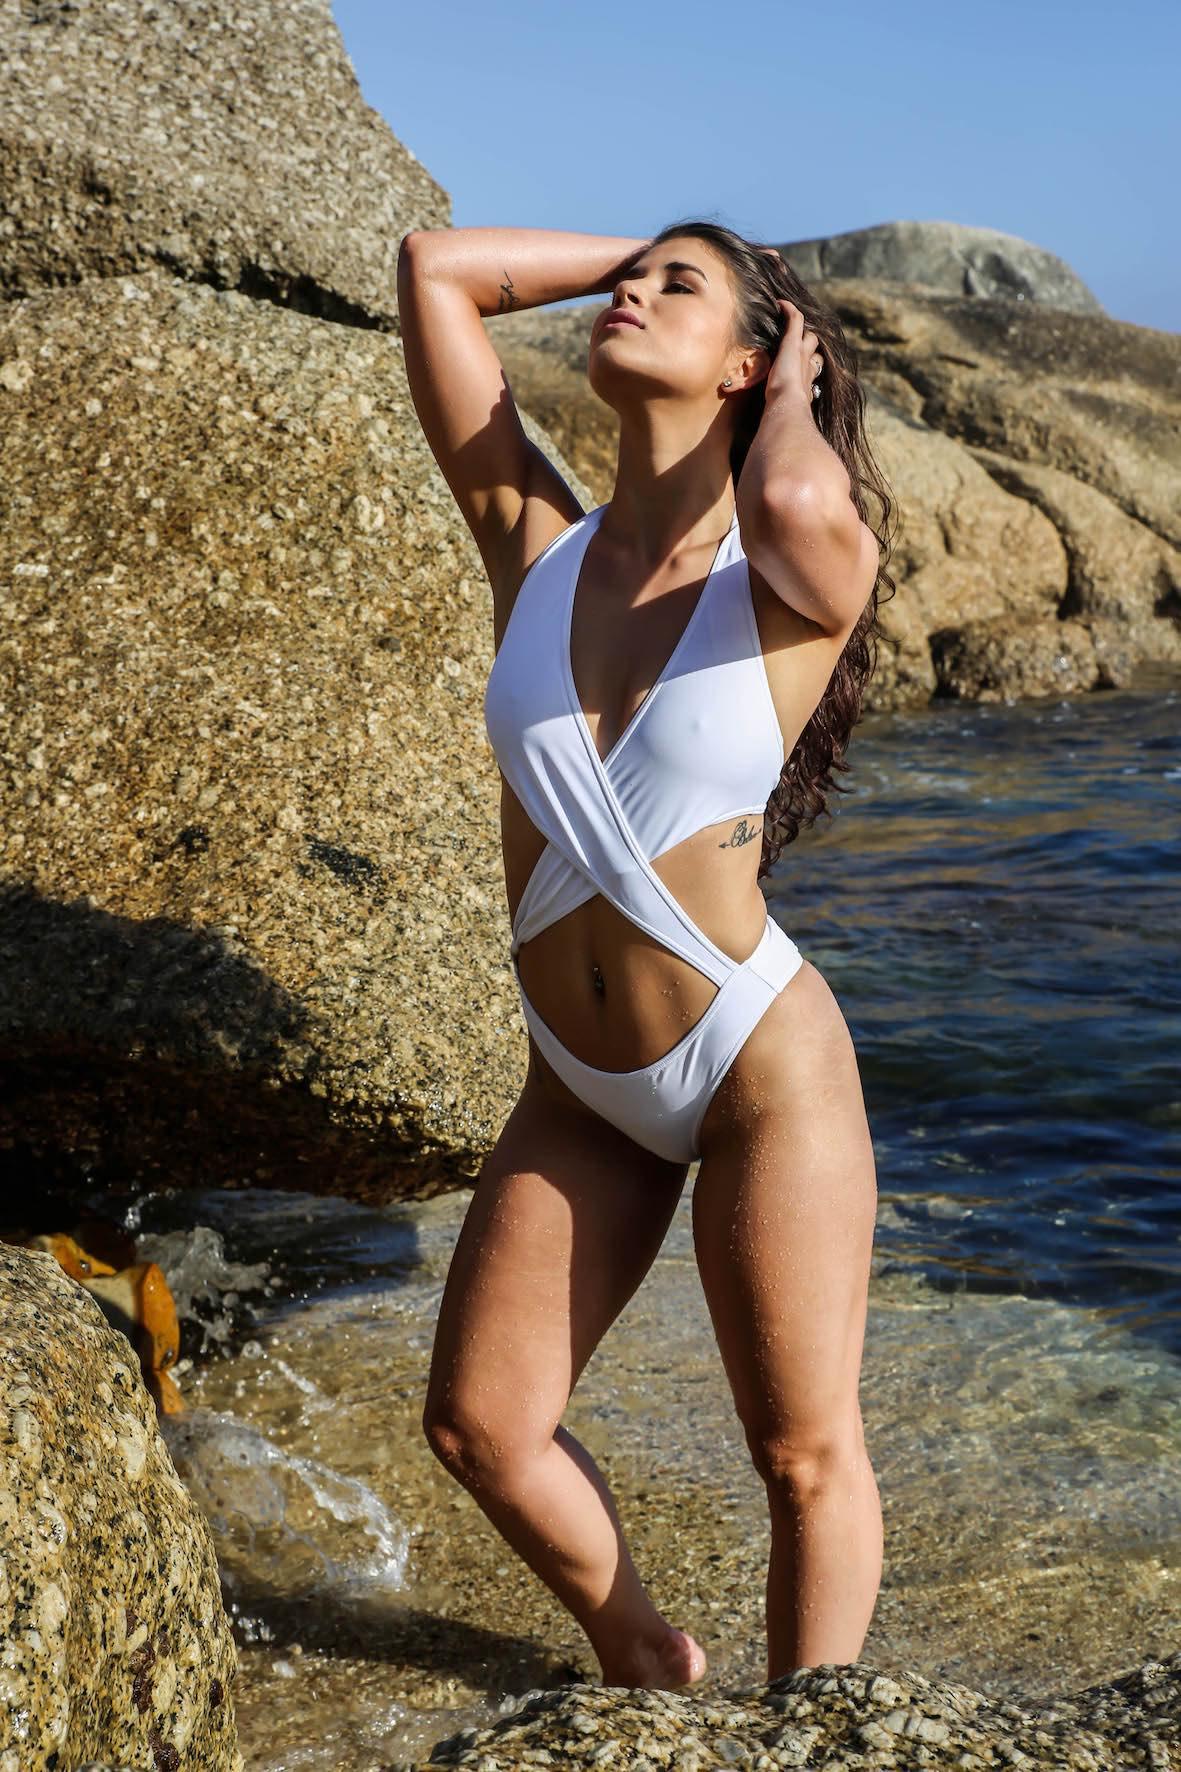 Meet this week's LW Babe Nathalie Faydherbe